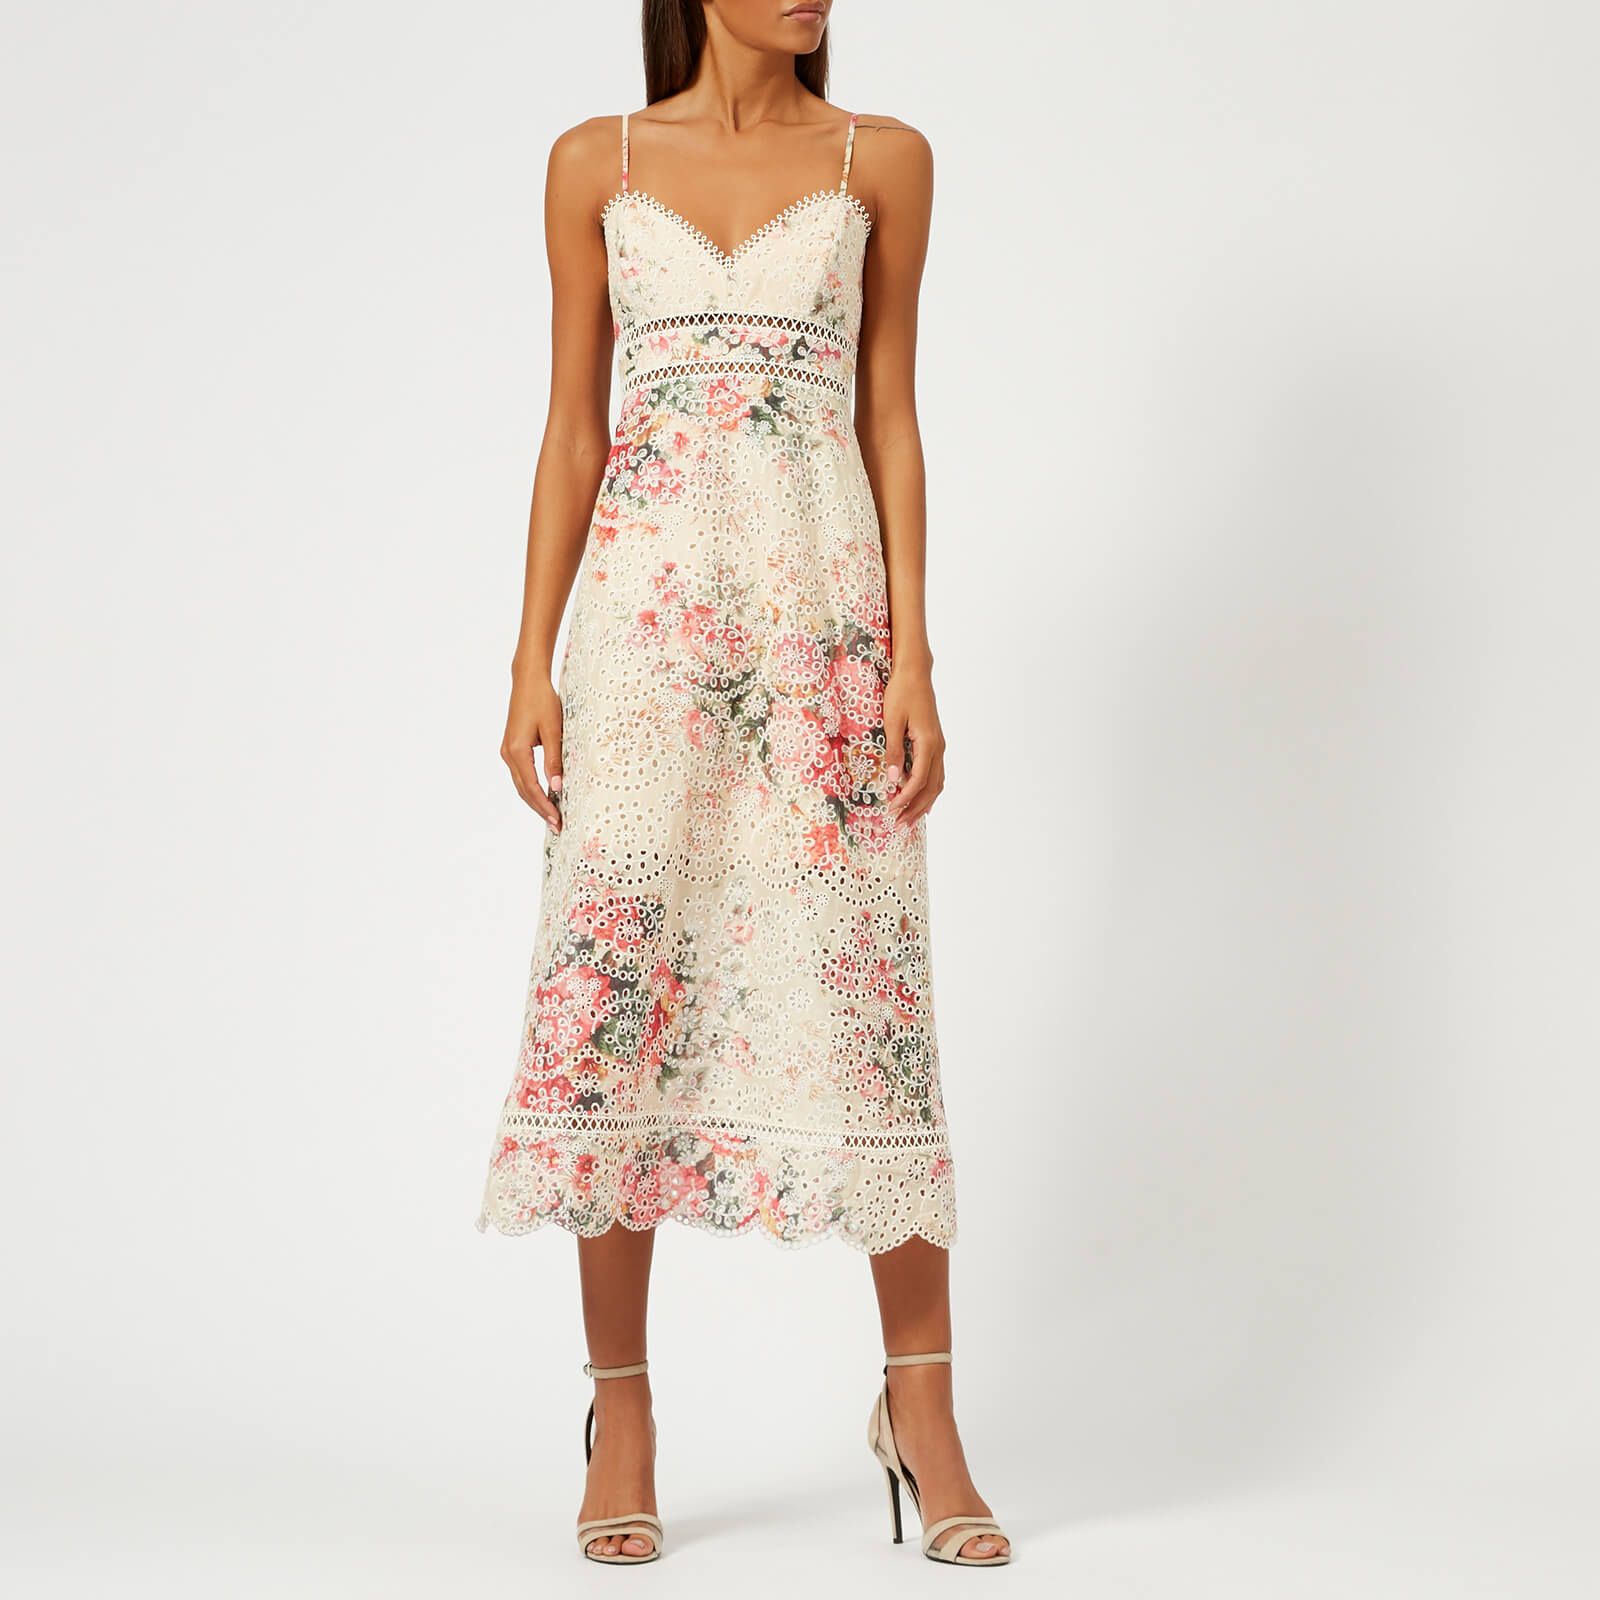 5cd3b8da865fc Zimmermann Women s Laelia Diamond Bralette Dress - Meadow Floral - Free UK  Delivery over £50